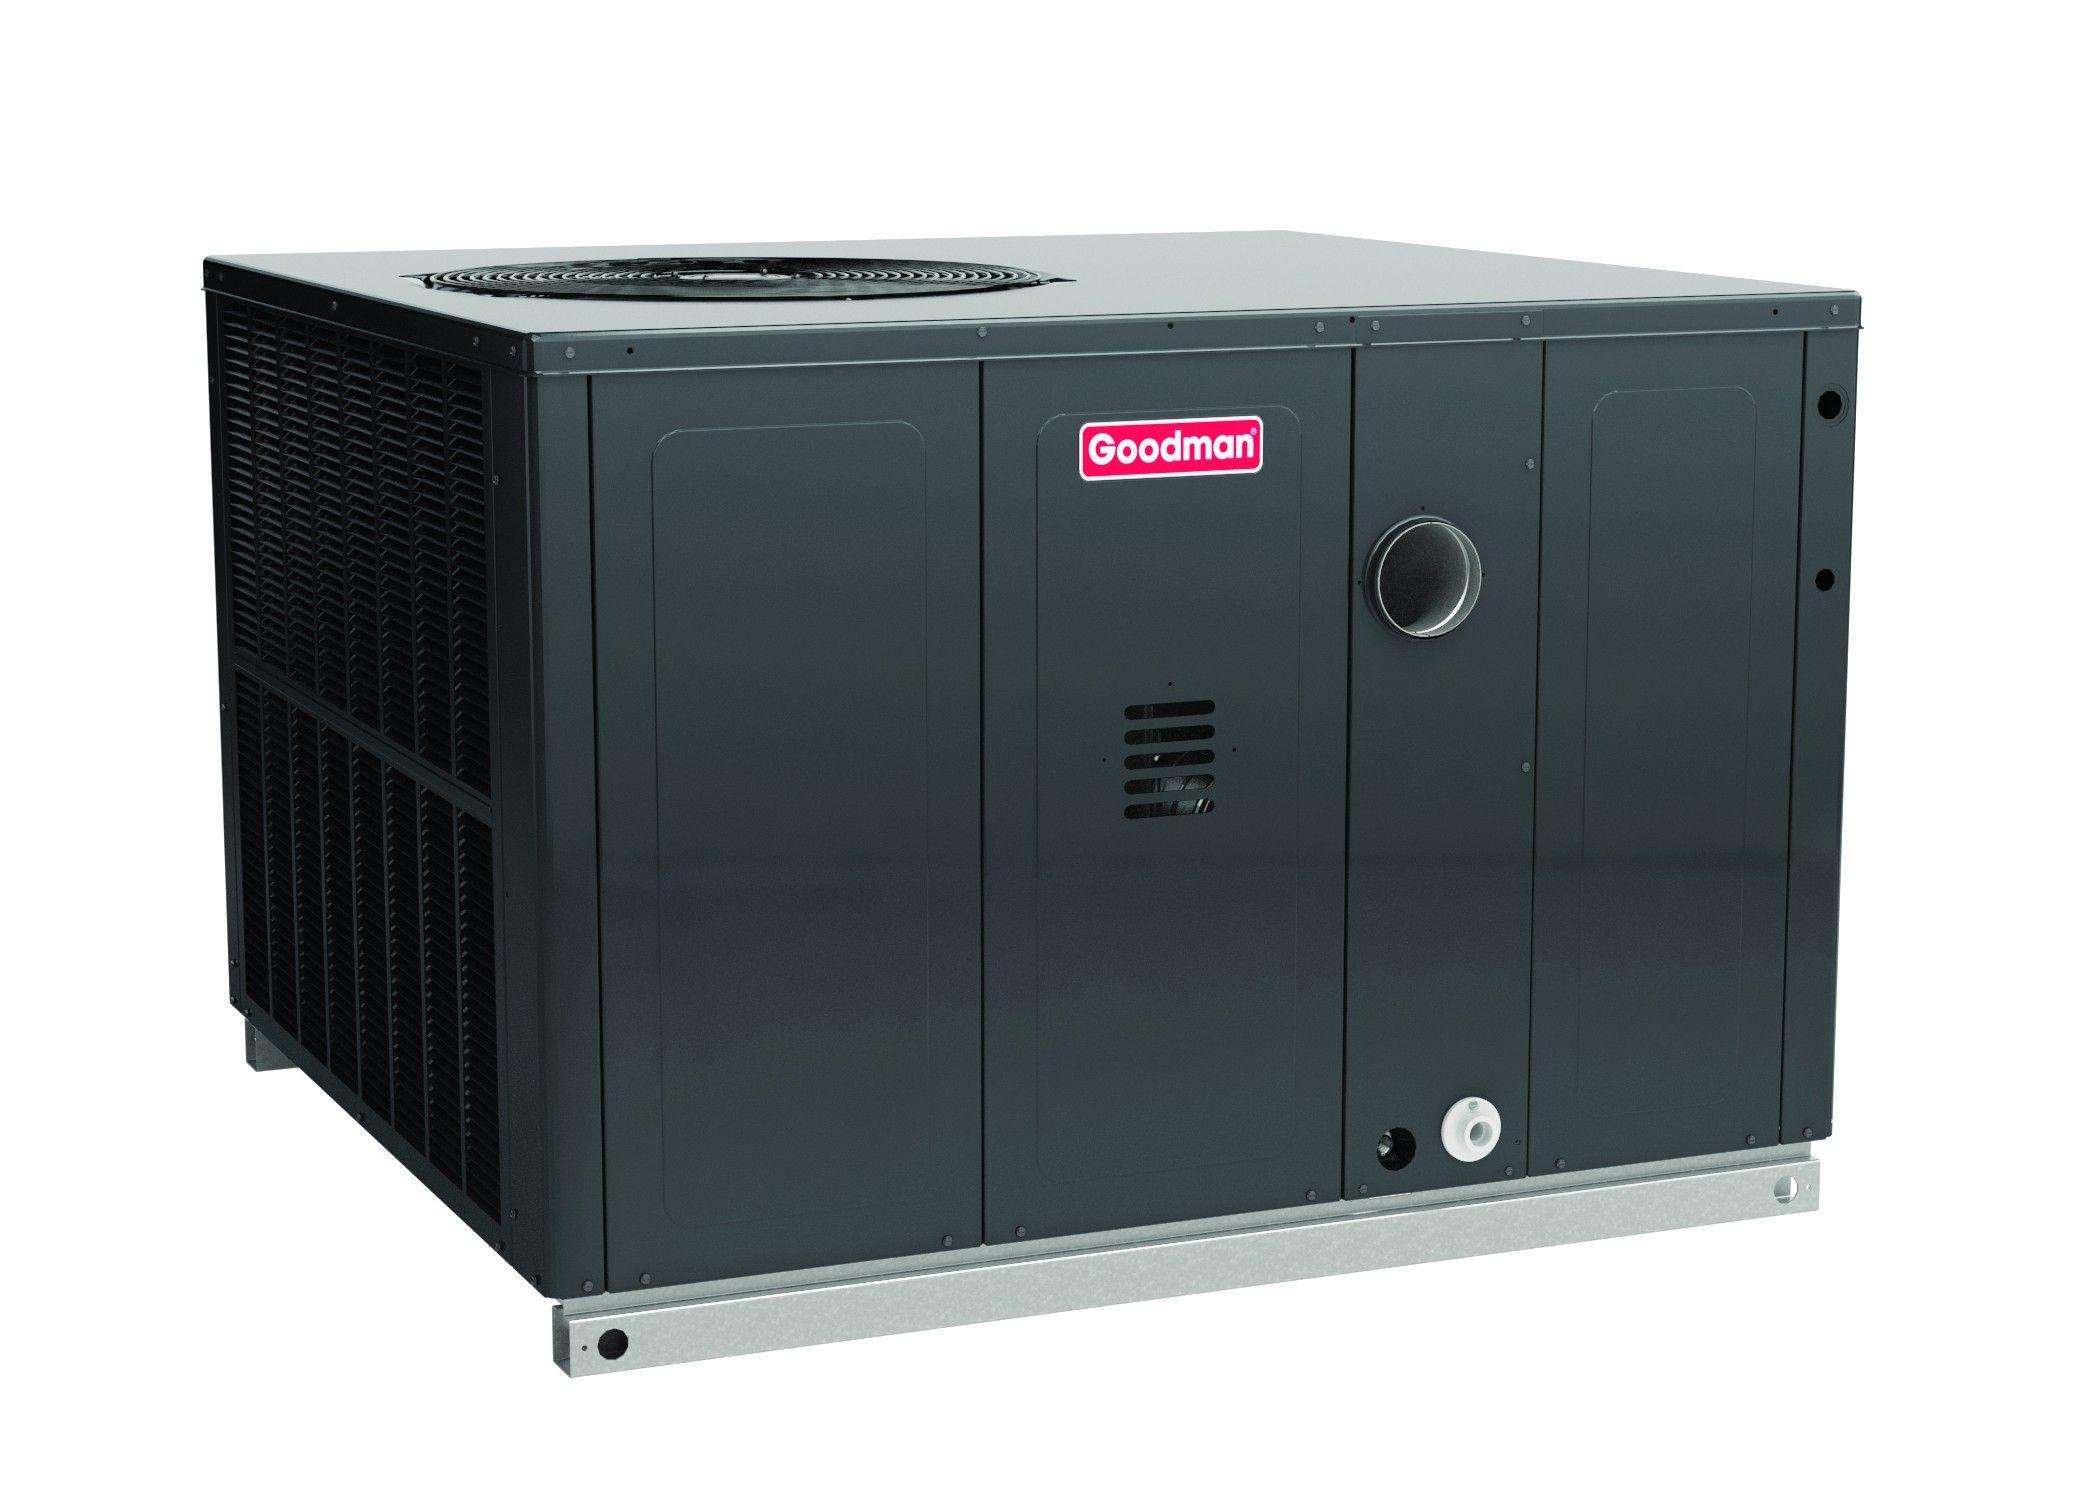 Goodman 4.0 Ton 14 SEER 80K BTU Package Unit with Gas Heat - GPG1448080M41A